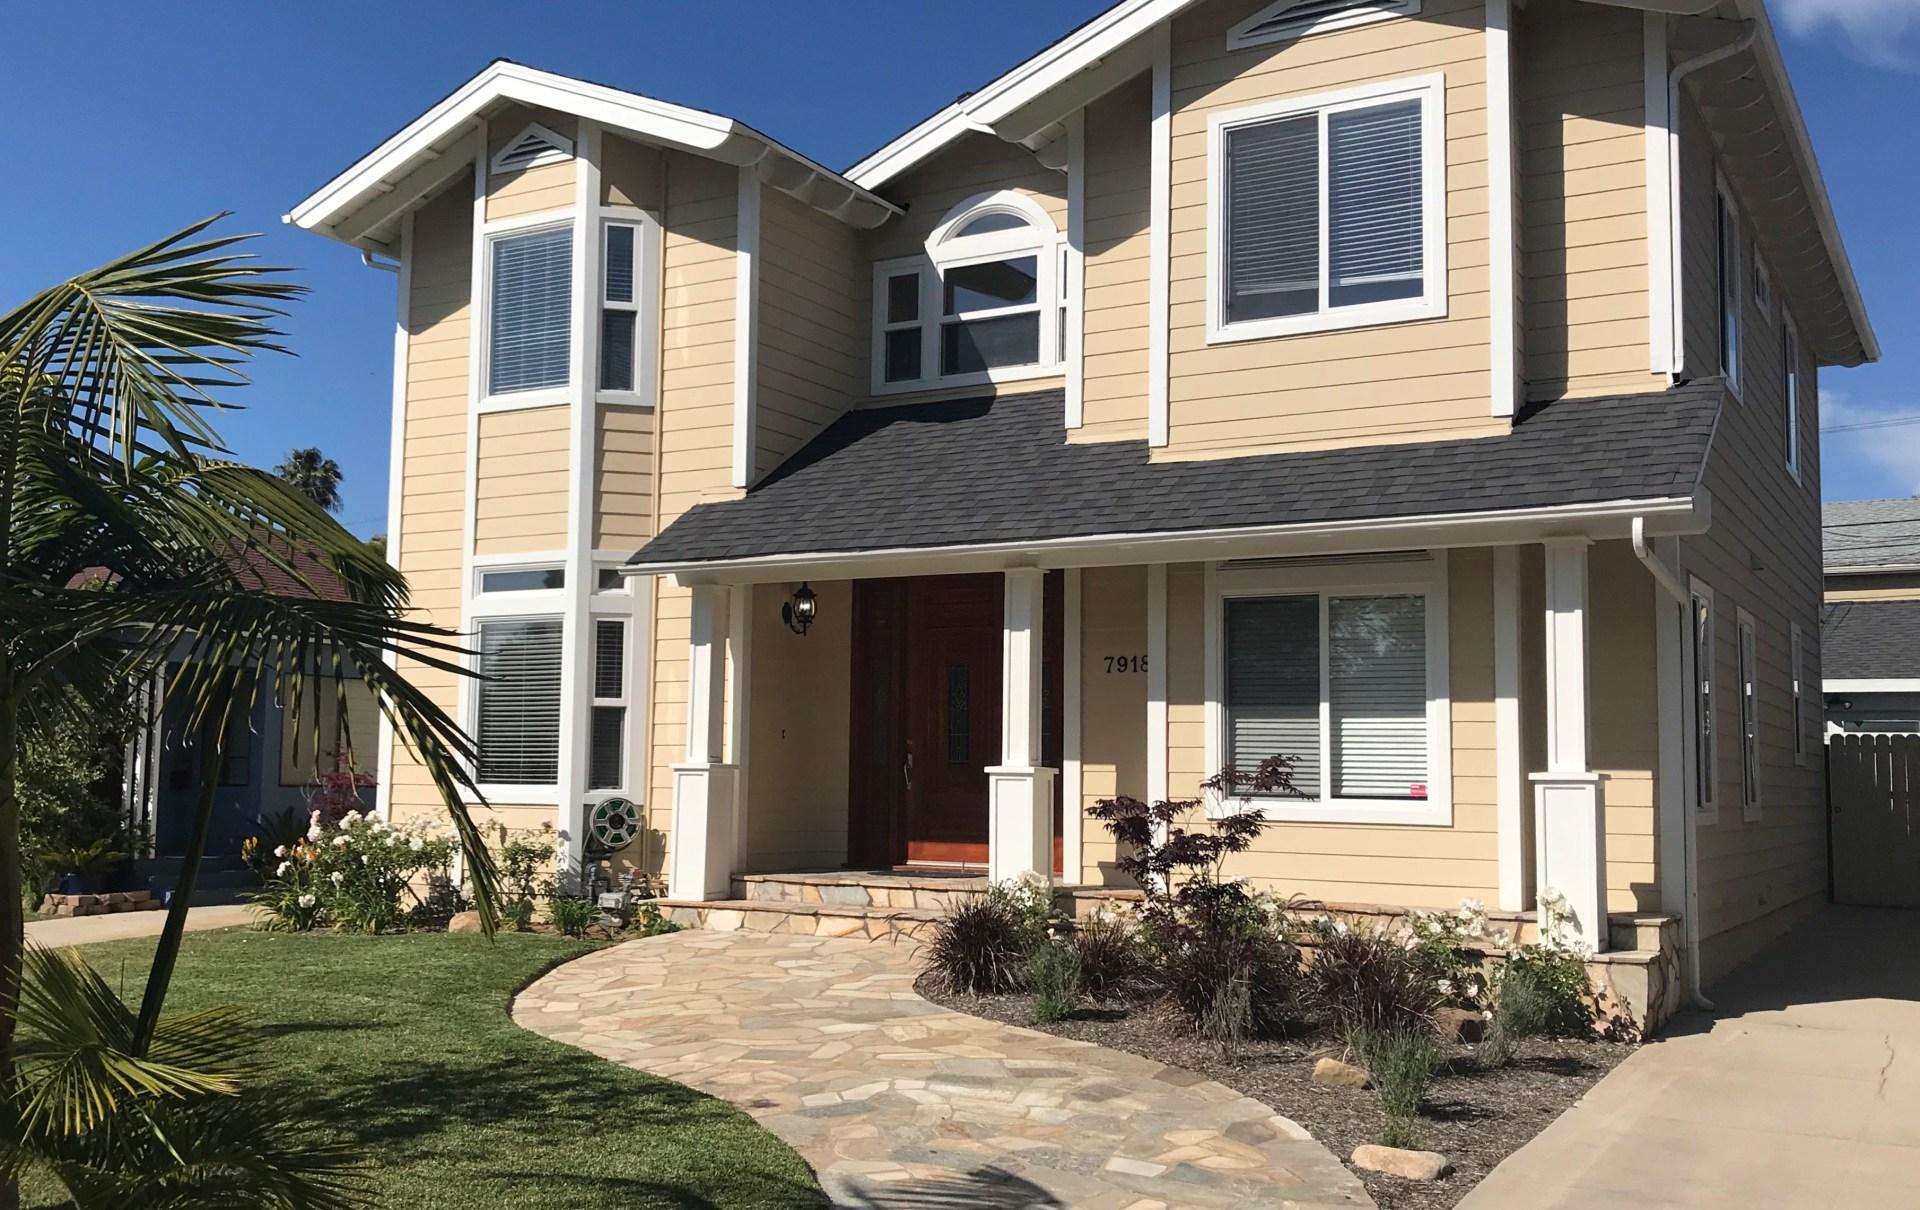 7918 Kenyon Ave. Los Angeles, CA 90045